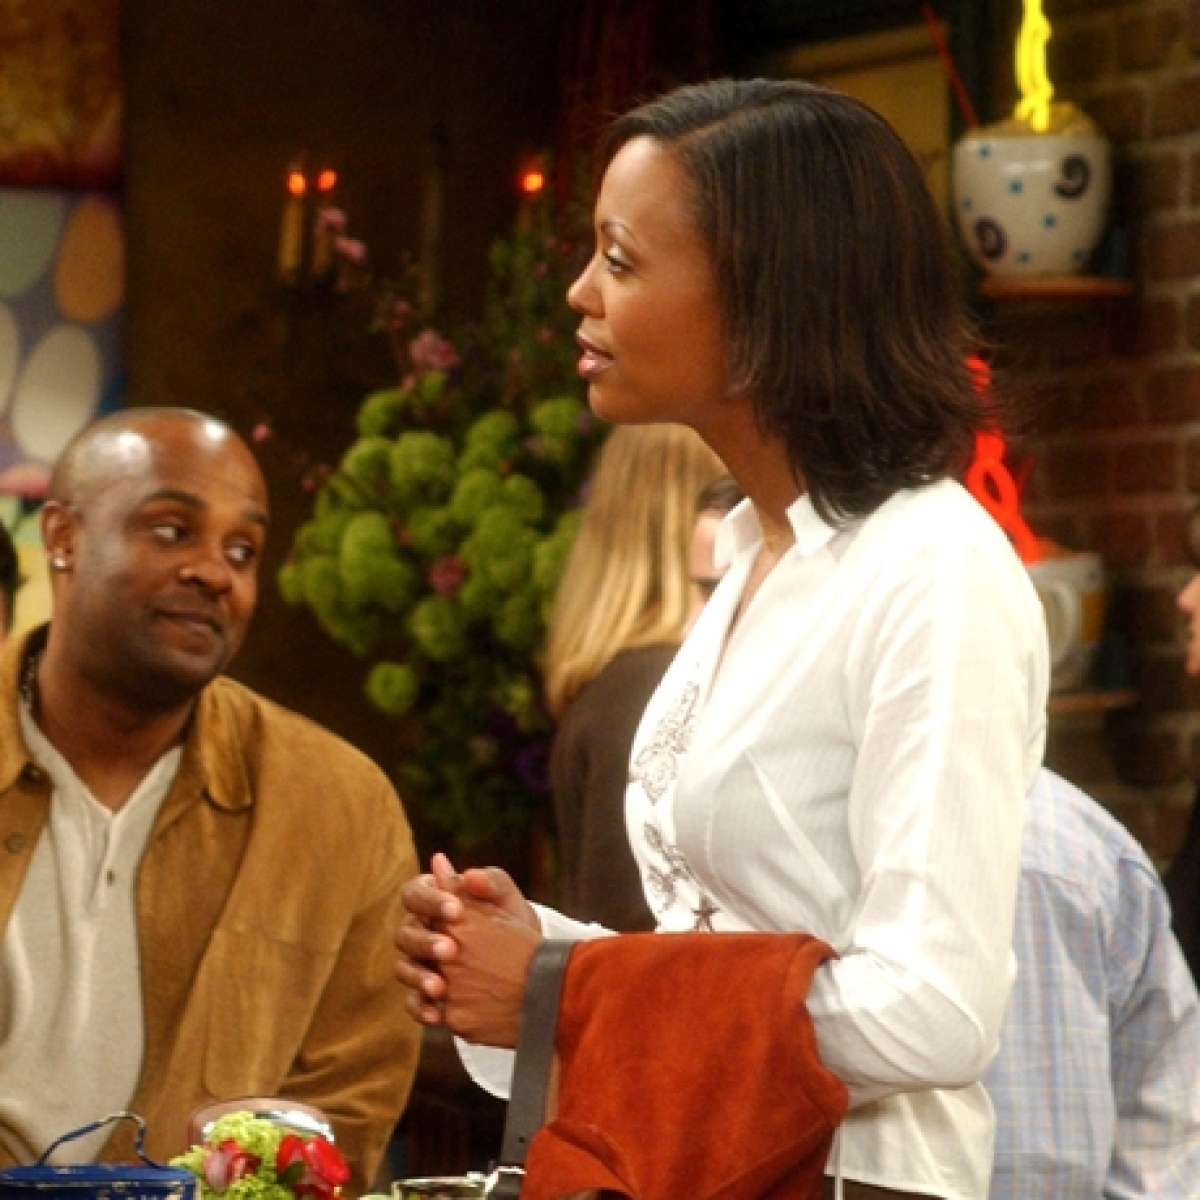 Friends co-creator Marta Kauffman admits to lack of diversity in the 90s sitcom